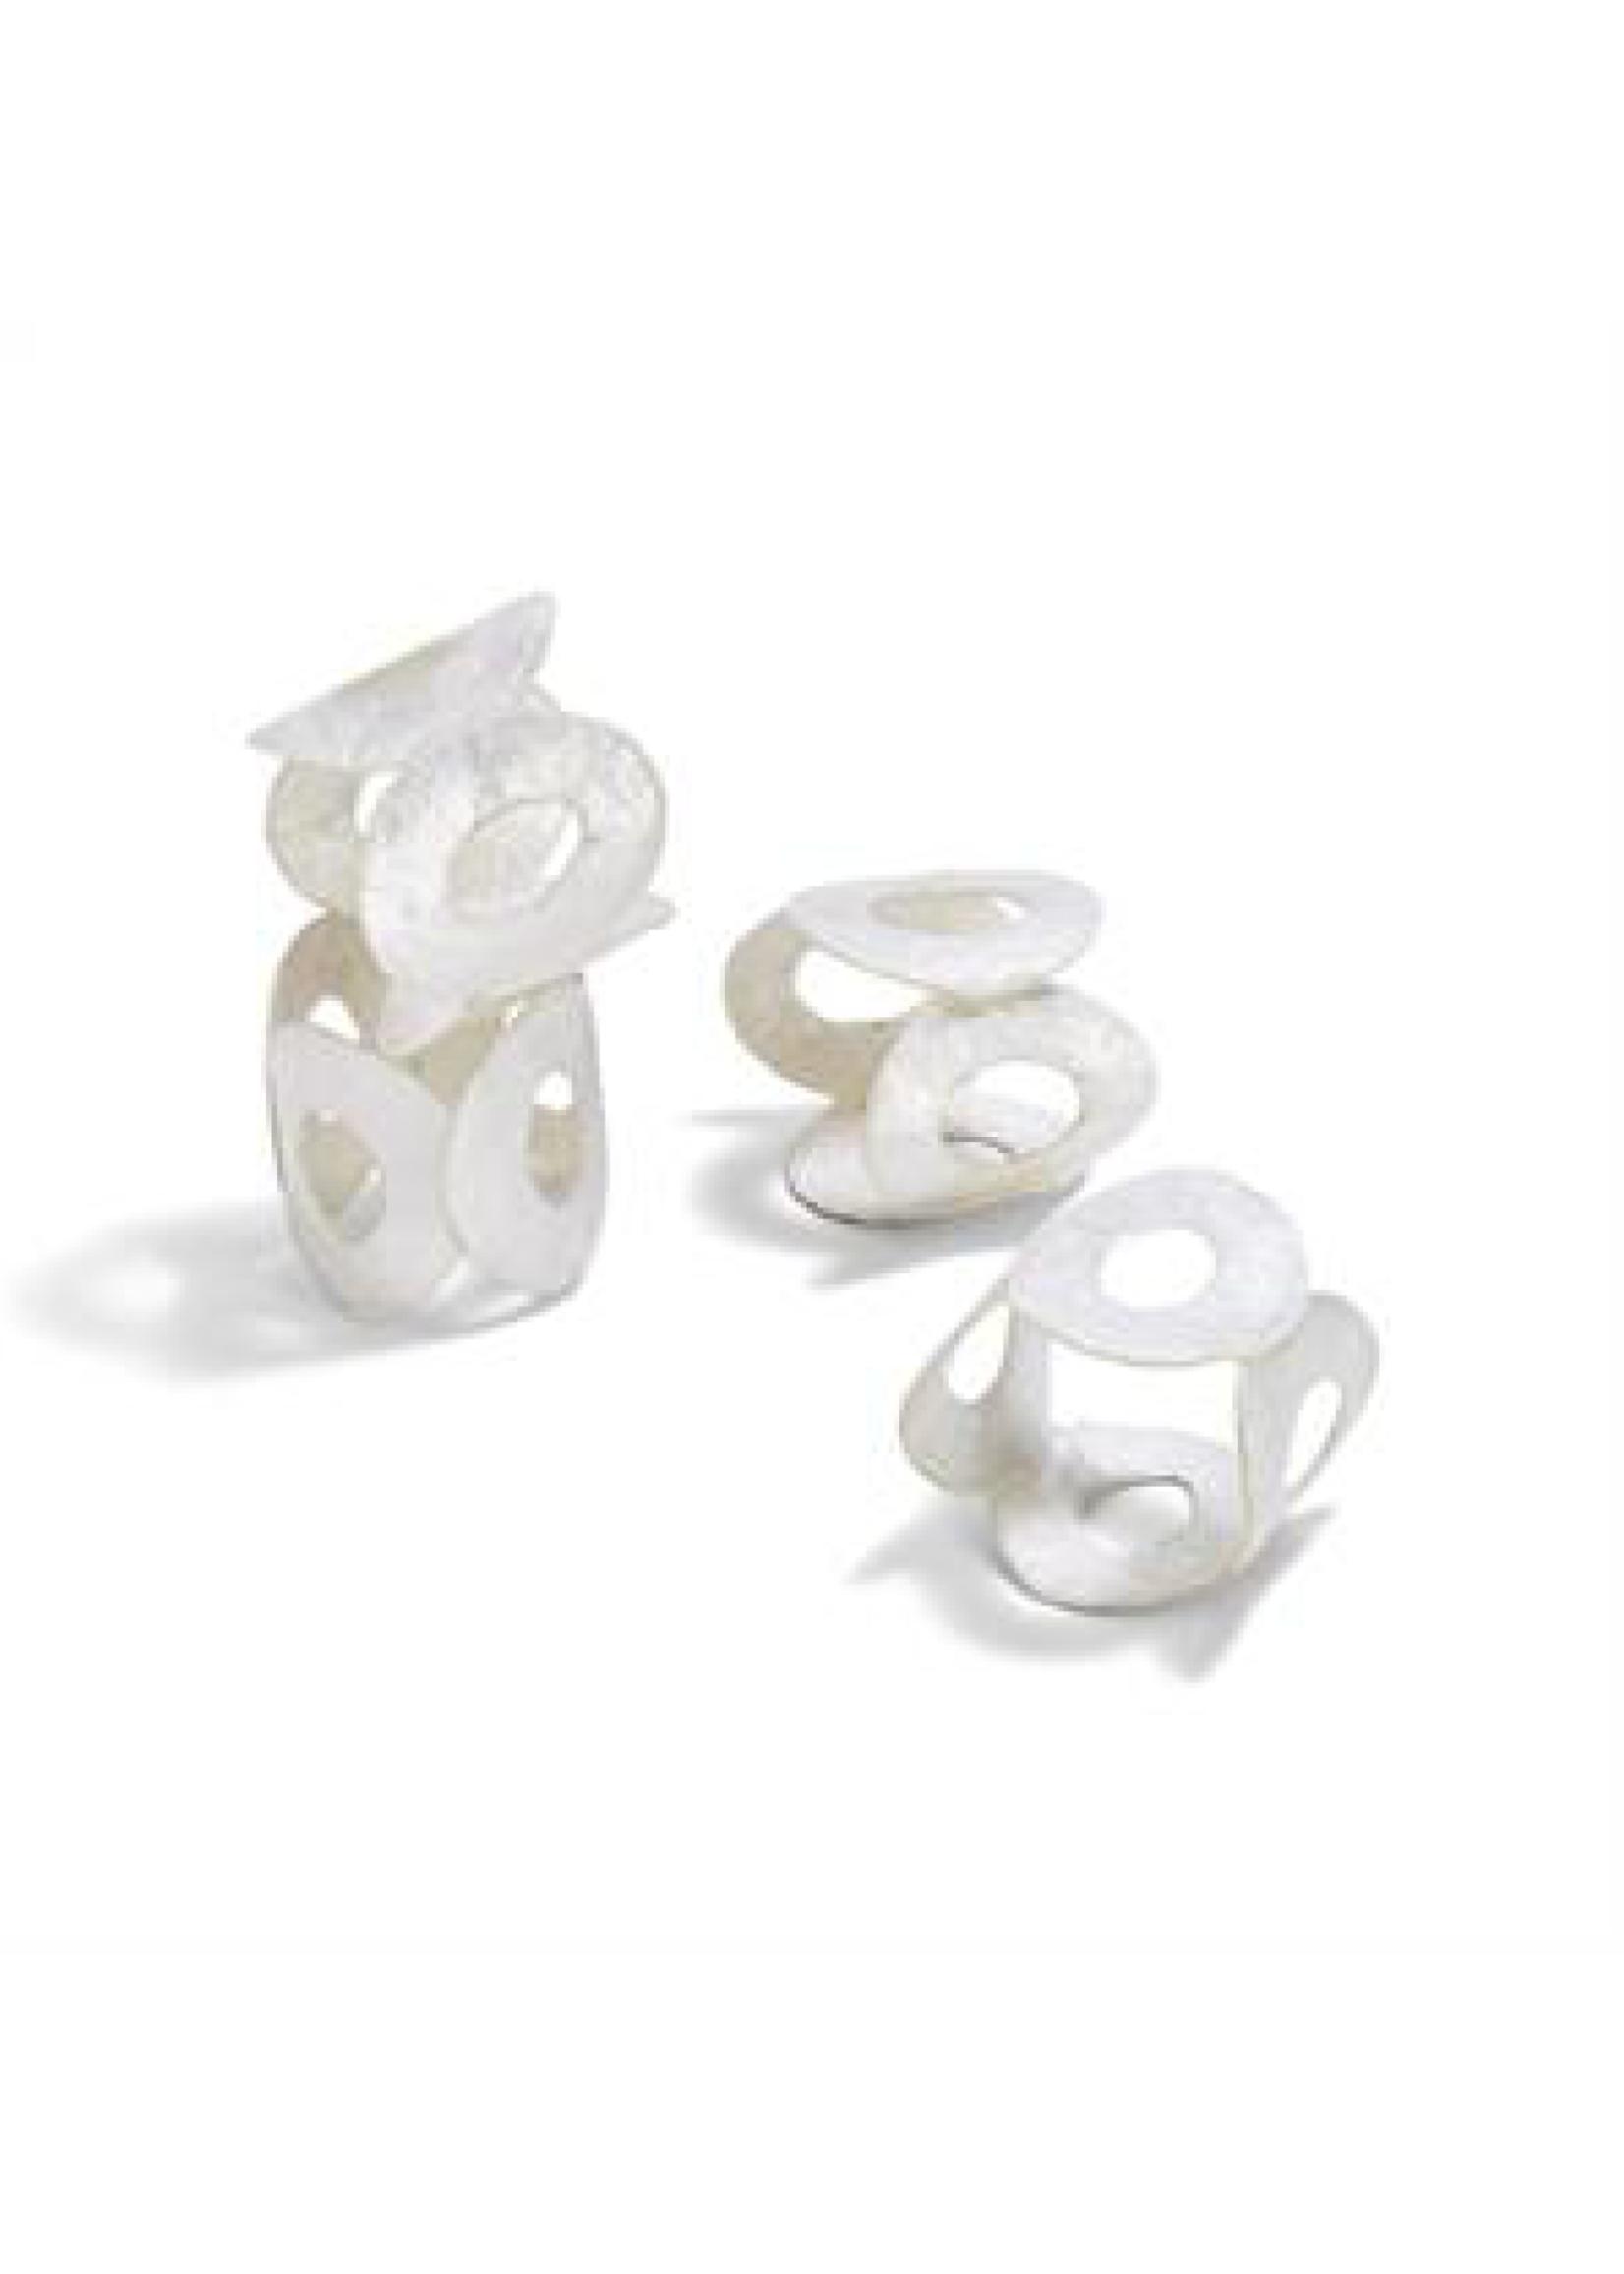 Two's Company, Inc. Capiz Shell Napkin Rings, Set 4